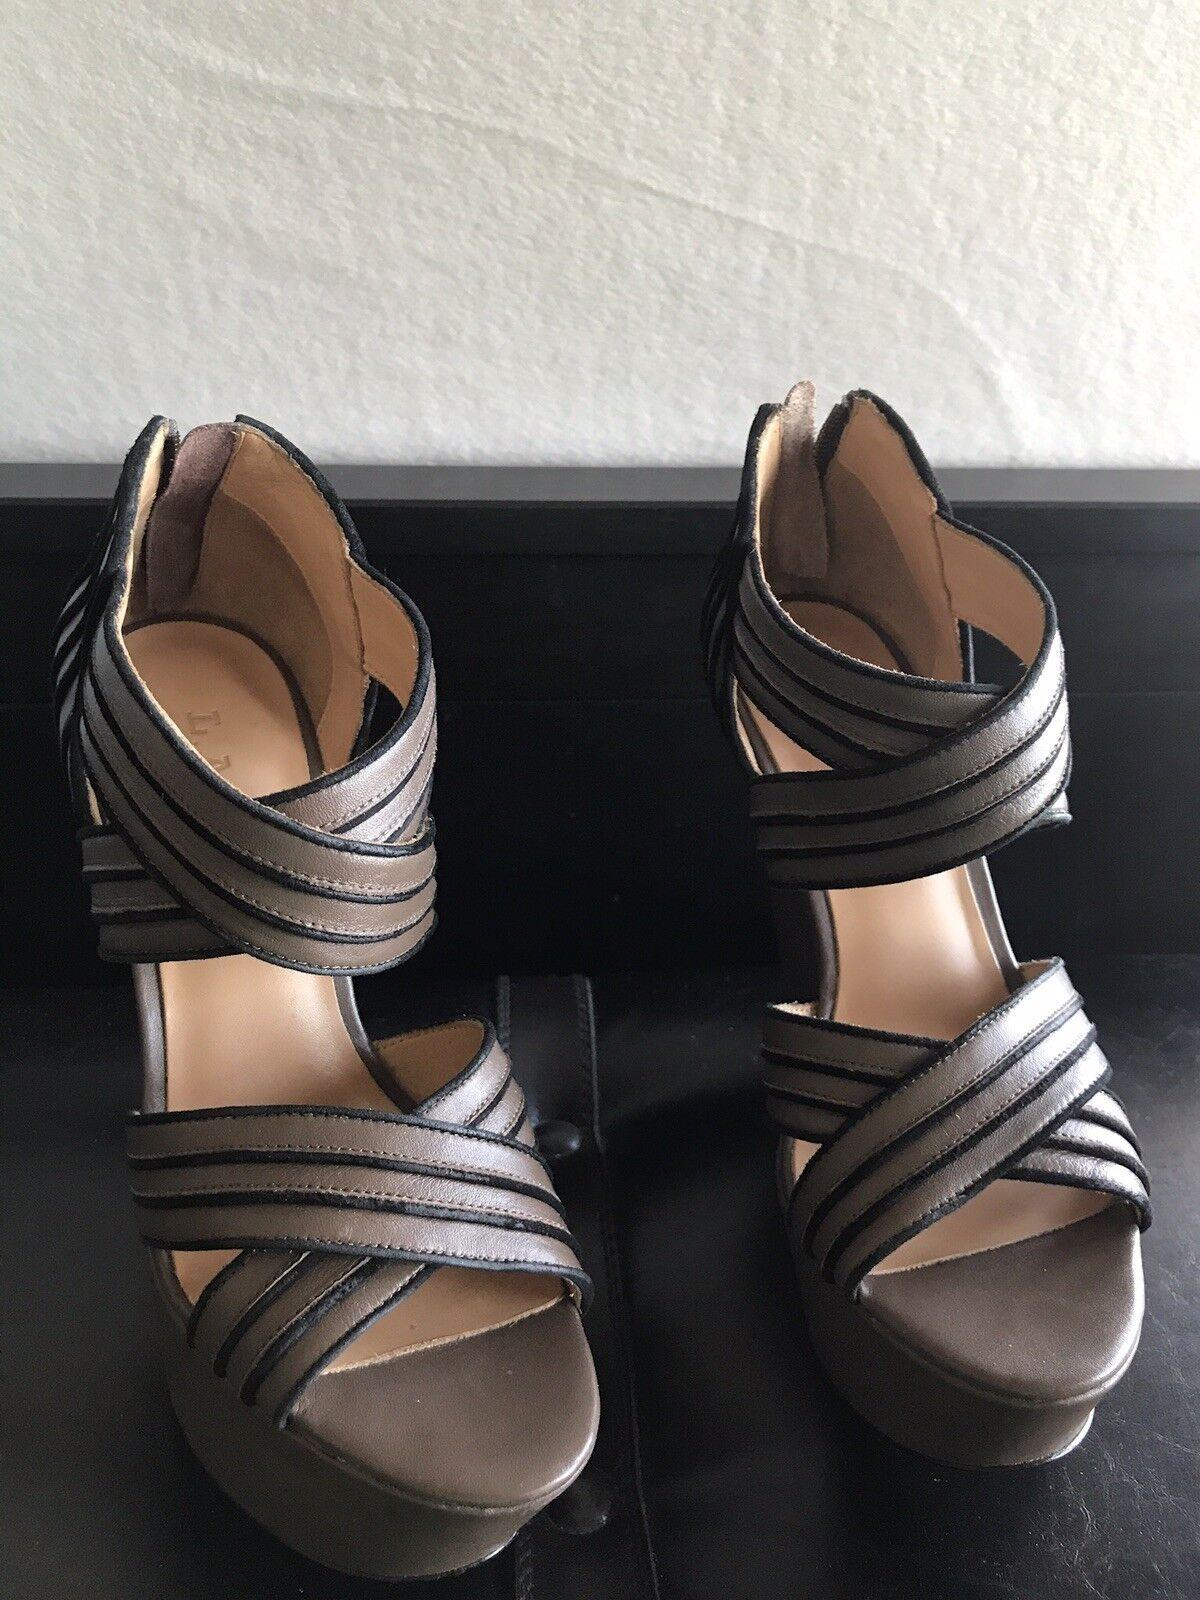 alta qualità generale Lamb Bernadette Wedge Wedge Wedge Sandals Sz 7.5  articoli promozionali